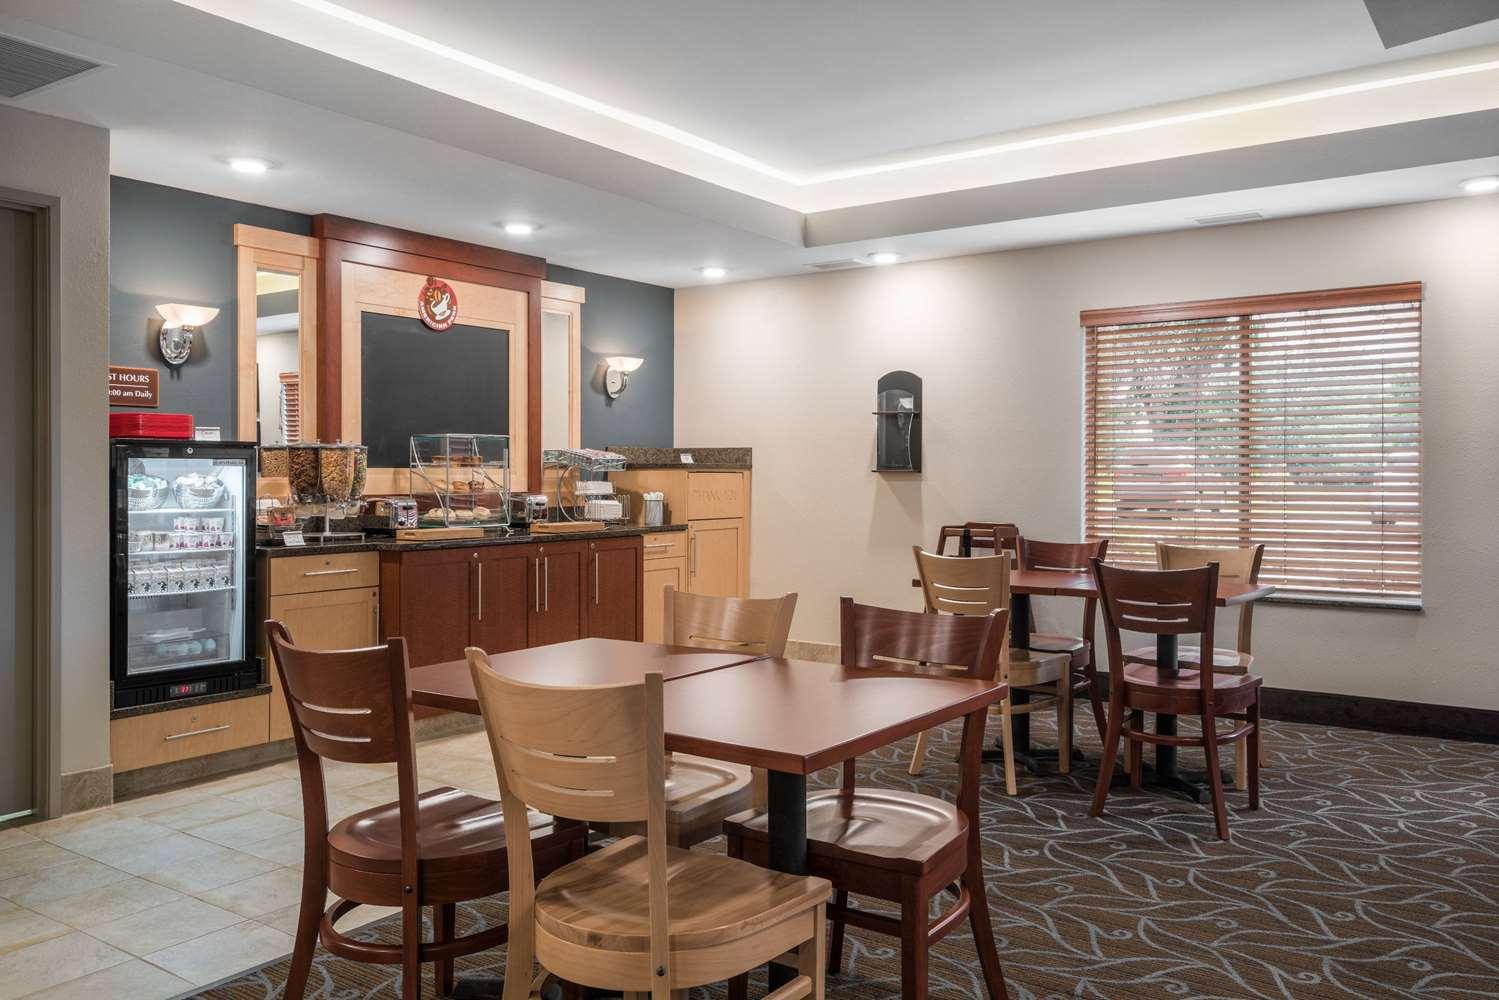 proam - AmericInn Hotel & Suites Winona